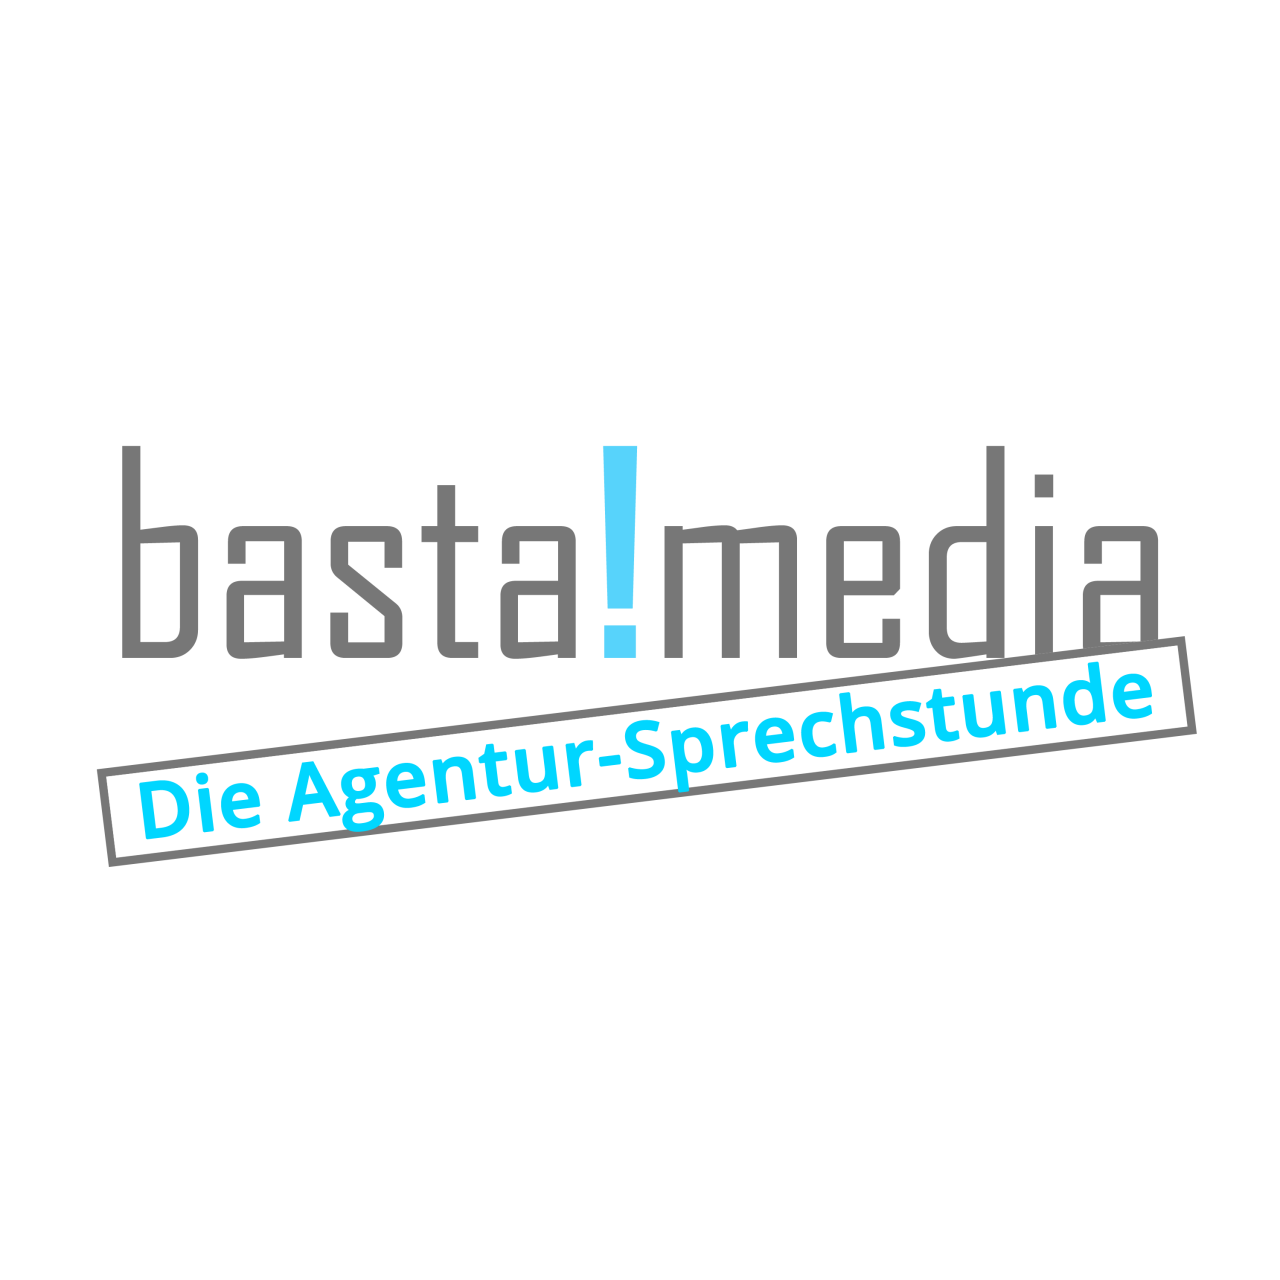 Podcast Folge 16: Eure Fragen zur neuen EU-Datenschutz-Grundverordnung (EU-DSGVO)